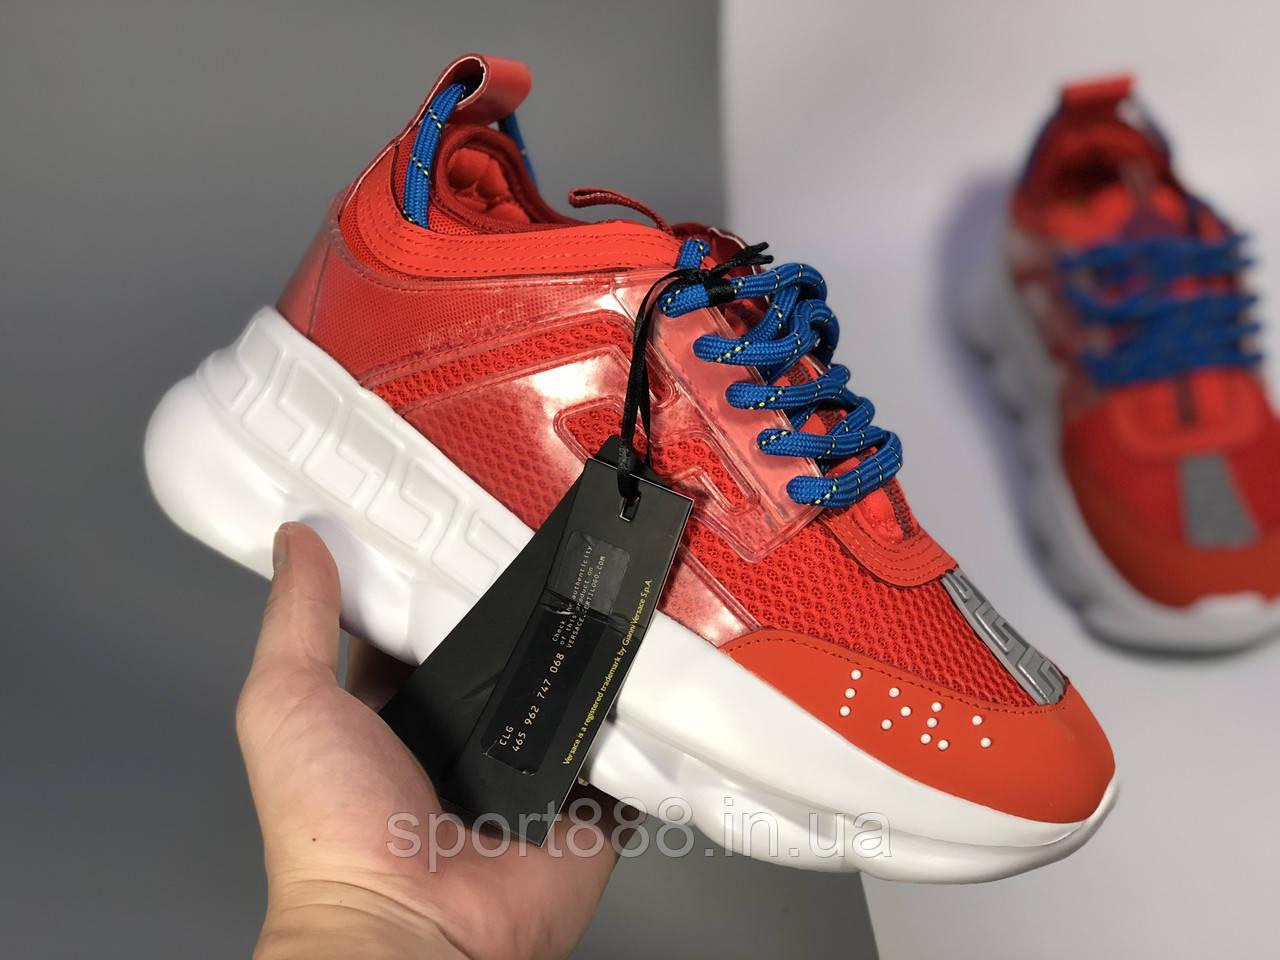 Versace Chain Reaction мужские и женские кроссовки  продажа, цена в ... ebbdbe909f2